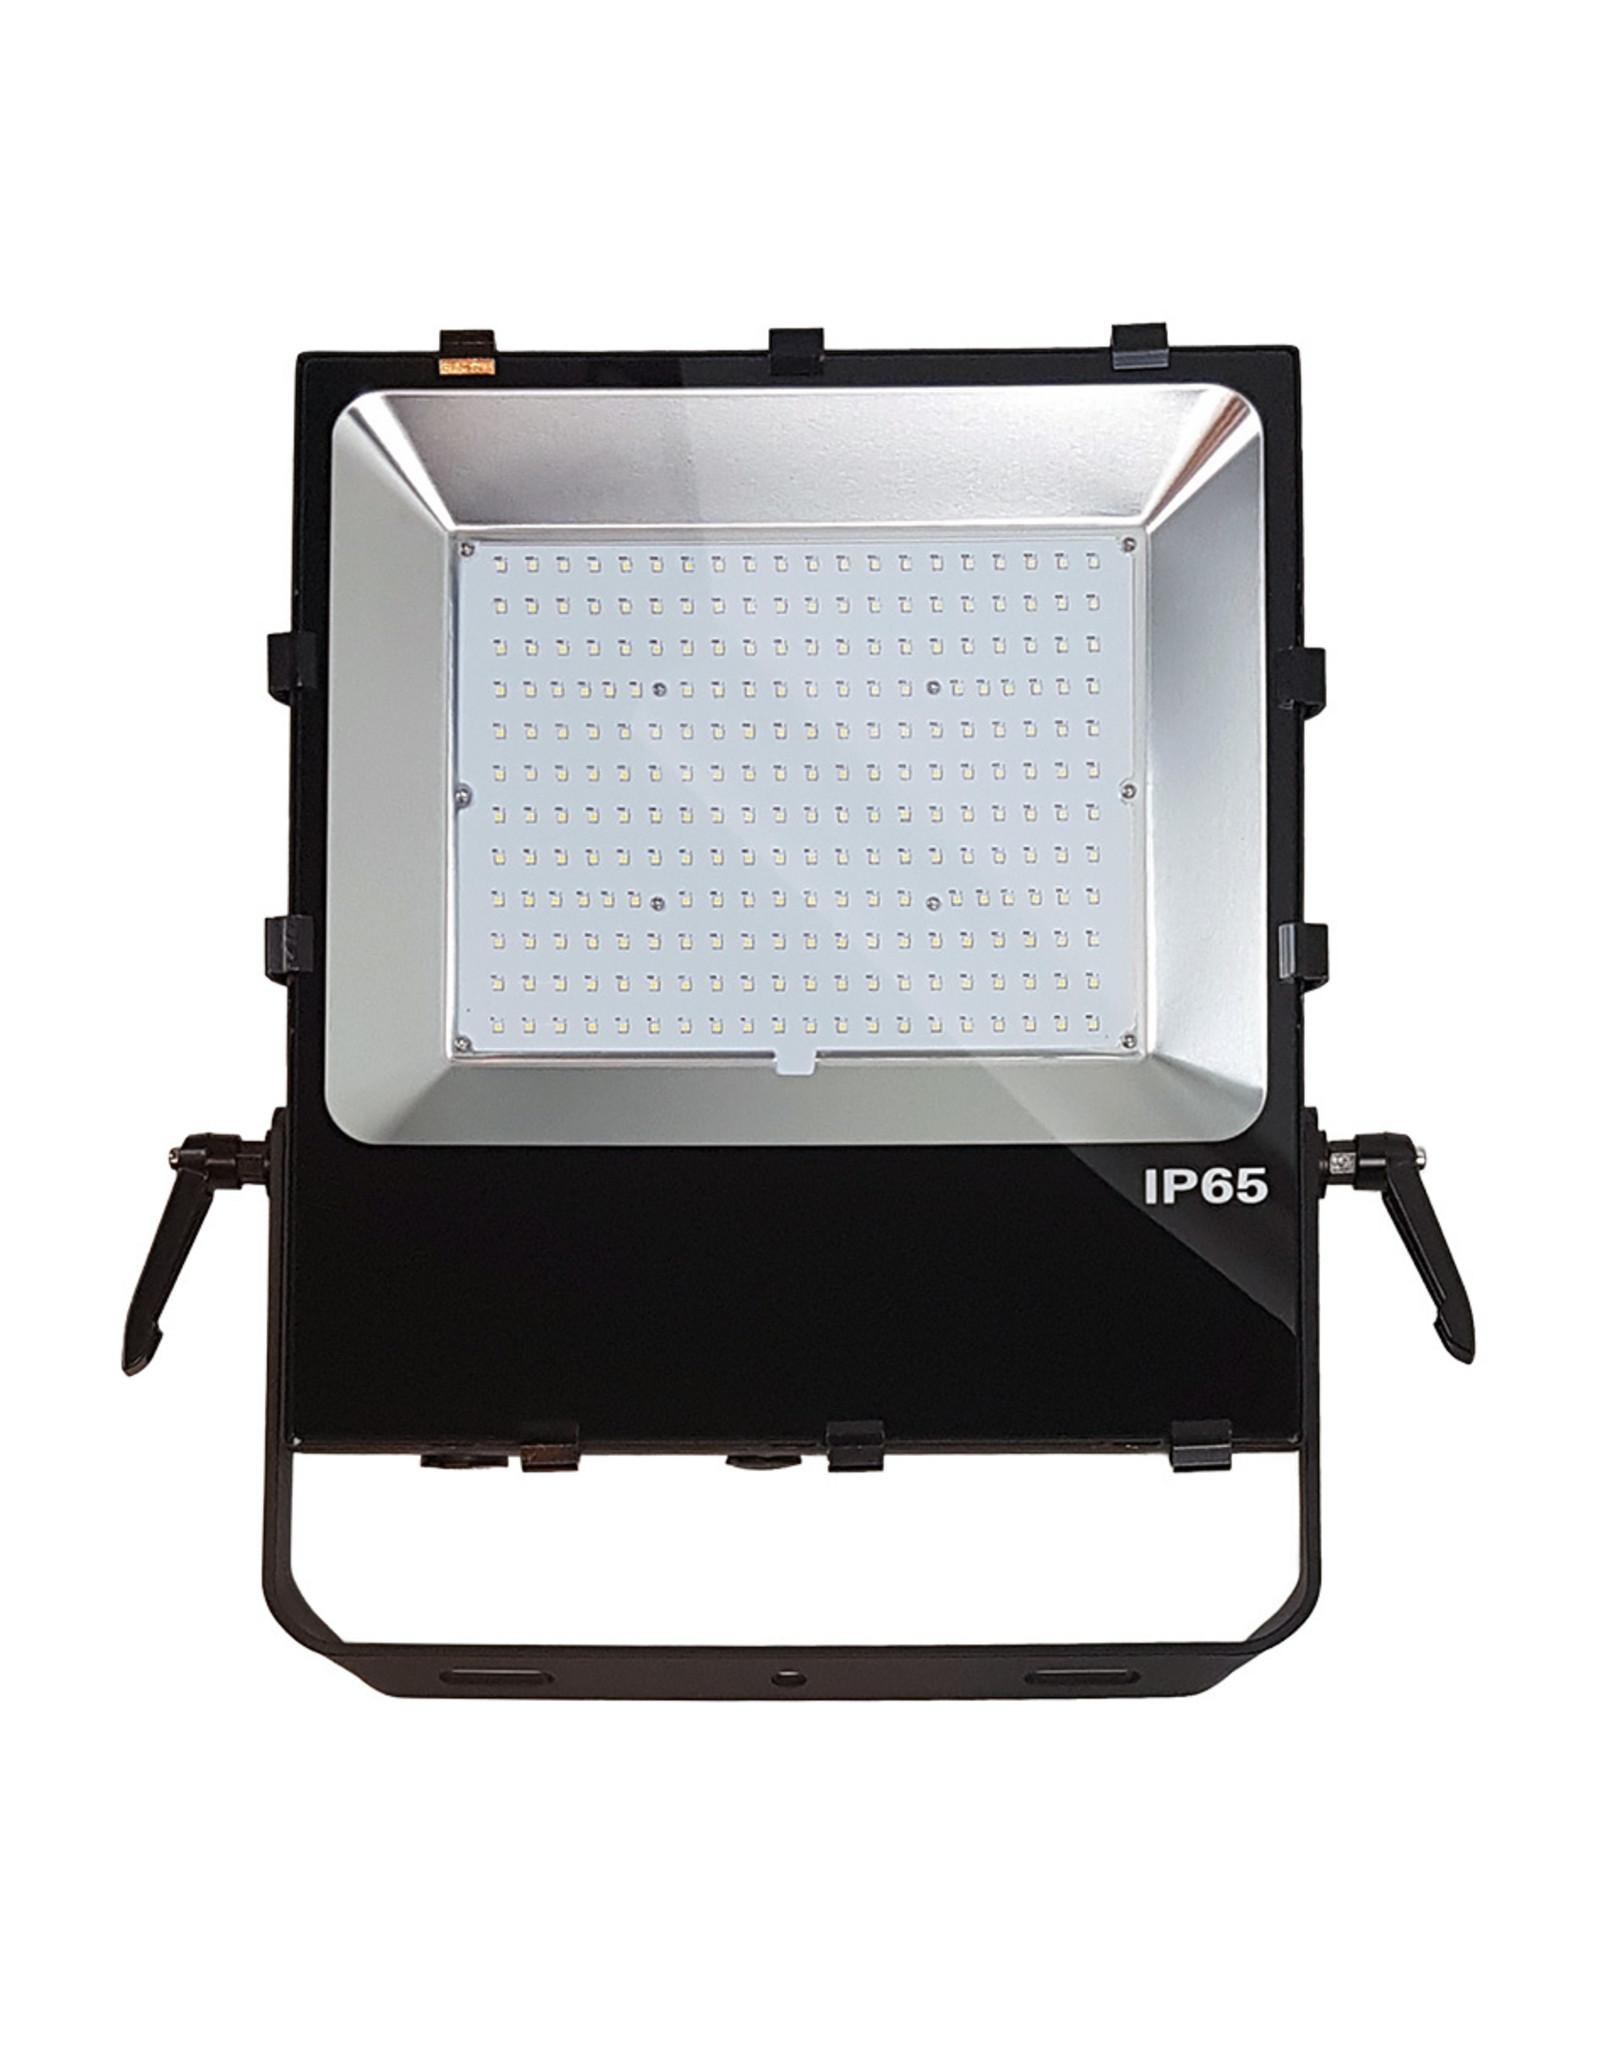 Lights Ekspoled200 - 200w flood light led - Powercon true - 5000k - 120°